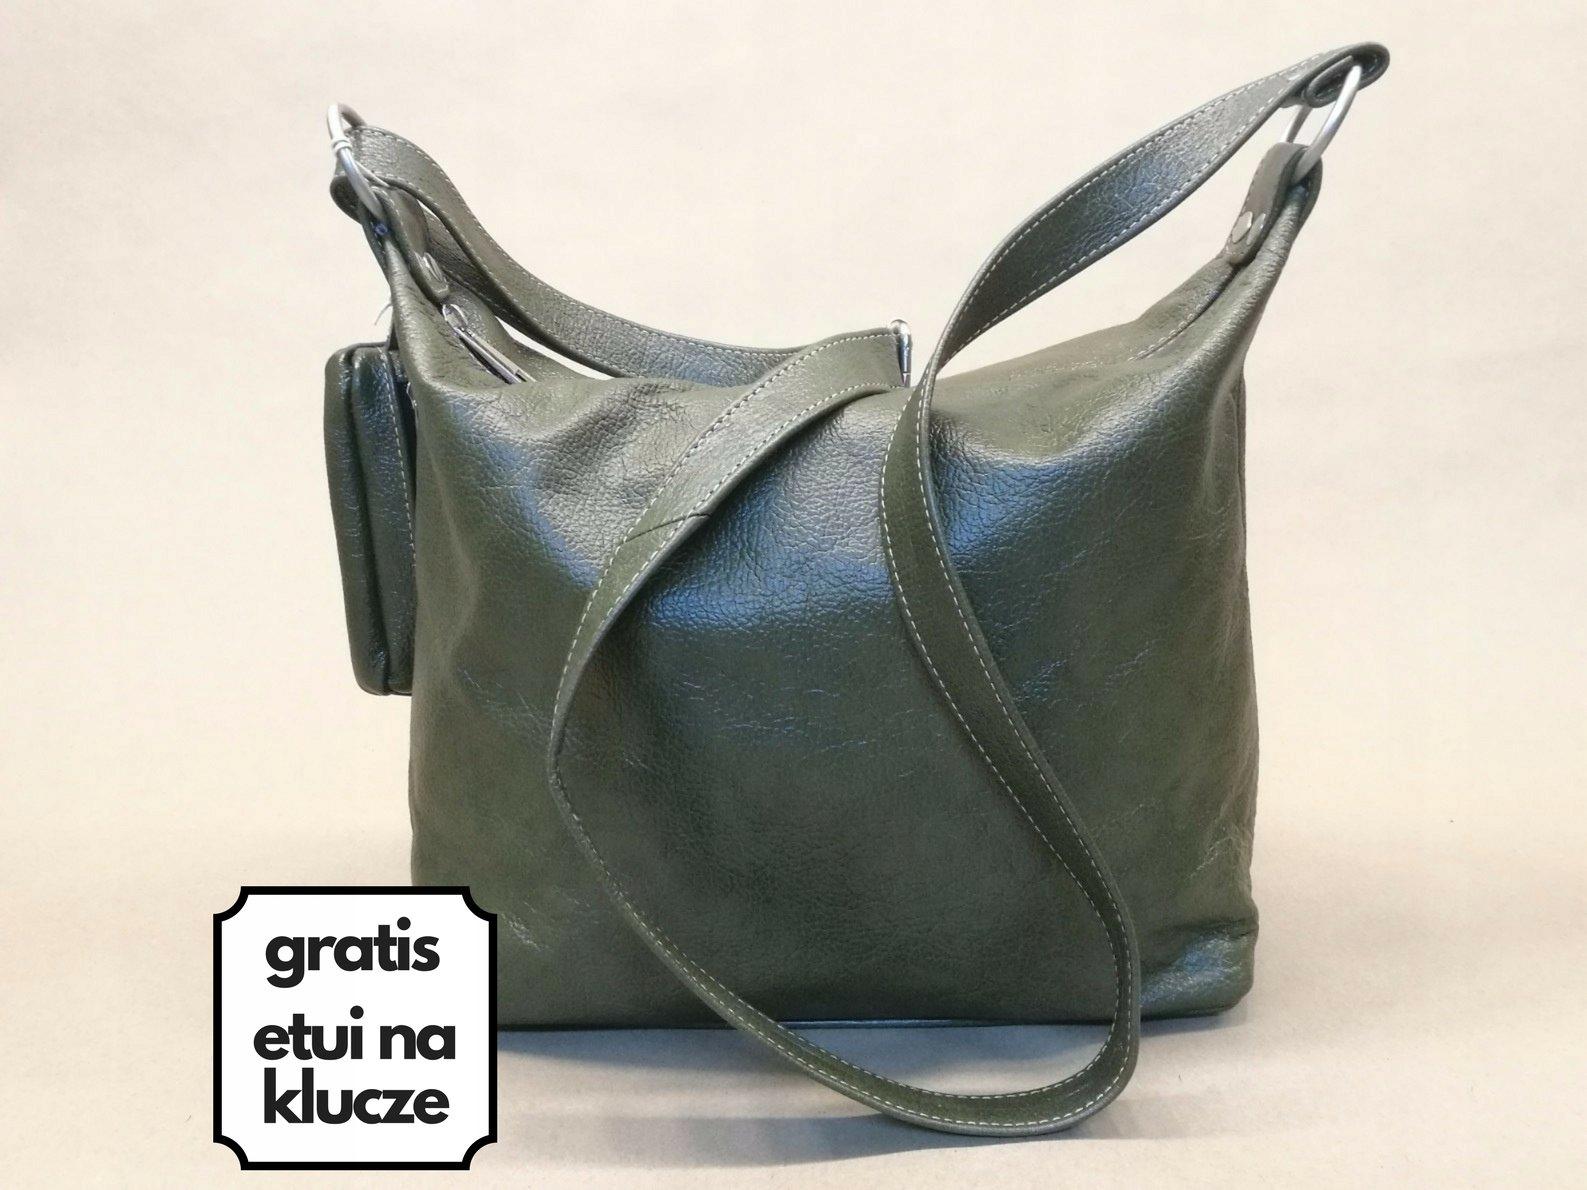 aa4847da31537 Skórzana torebka zieleń handmade SQRATORIUM - 7379738836 - oficjalne ...